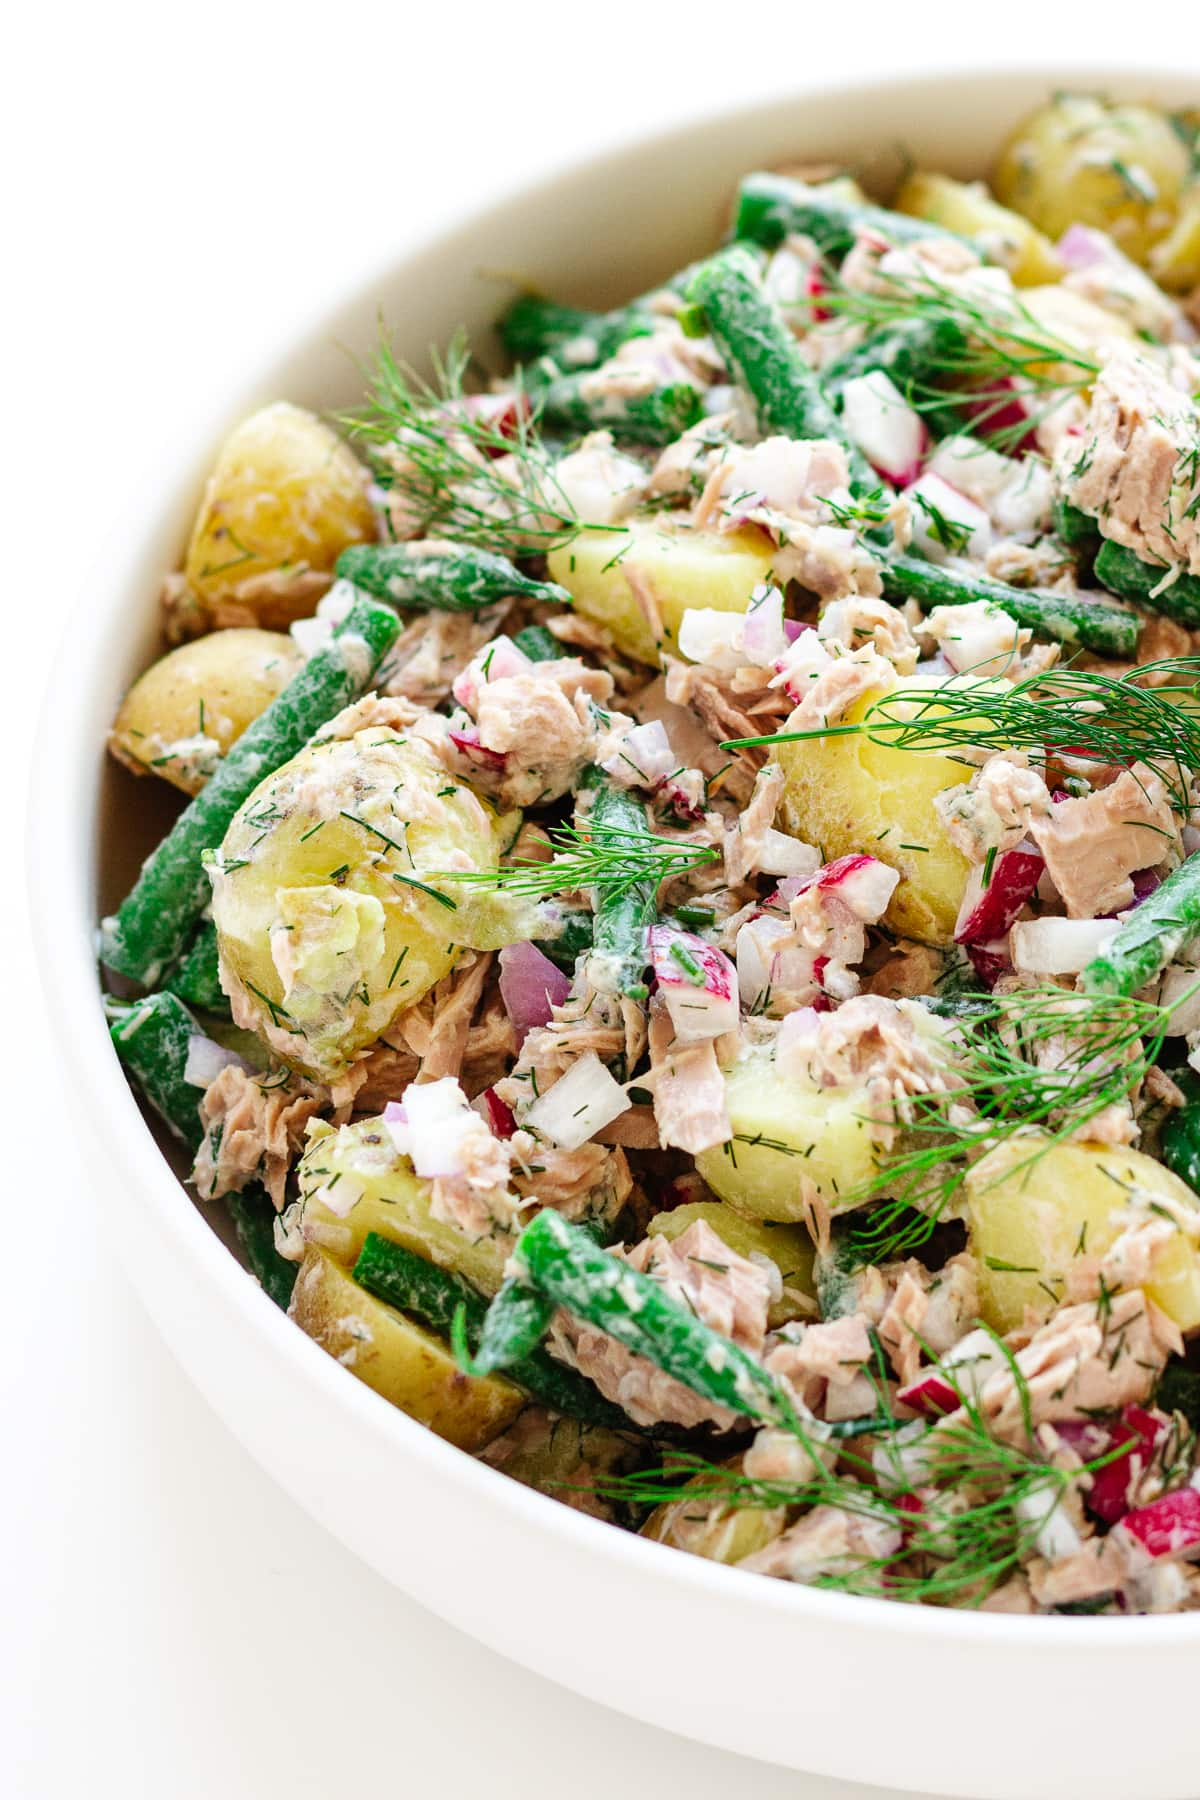 Close up photo of tuna potato salad in white bowl.